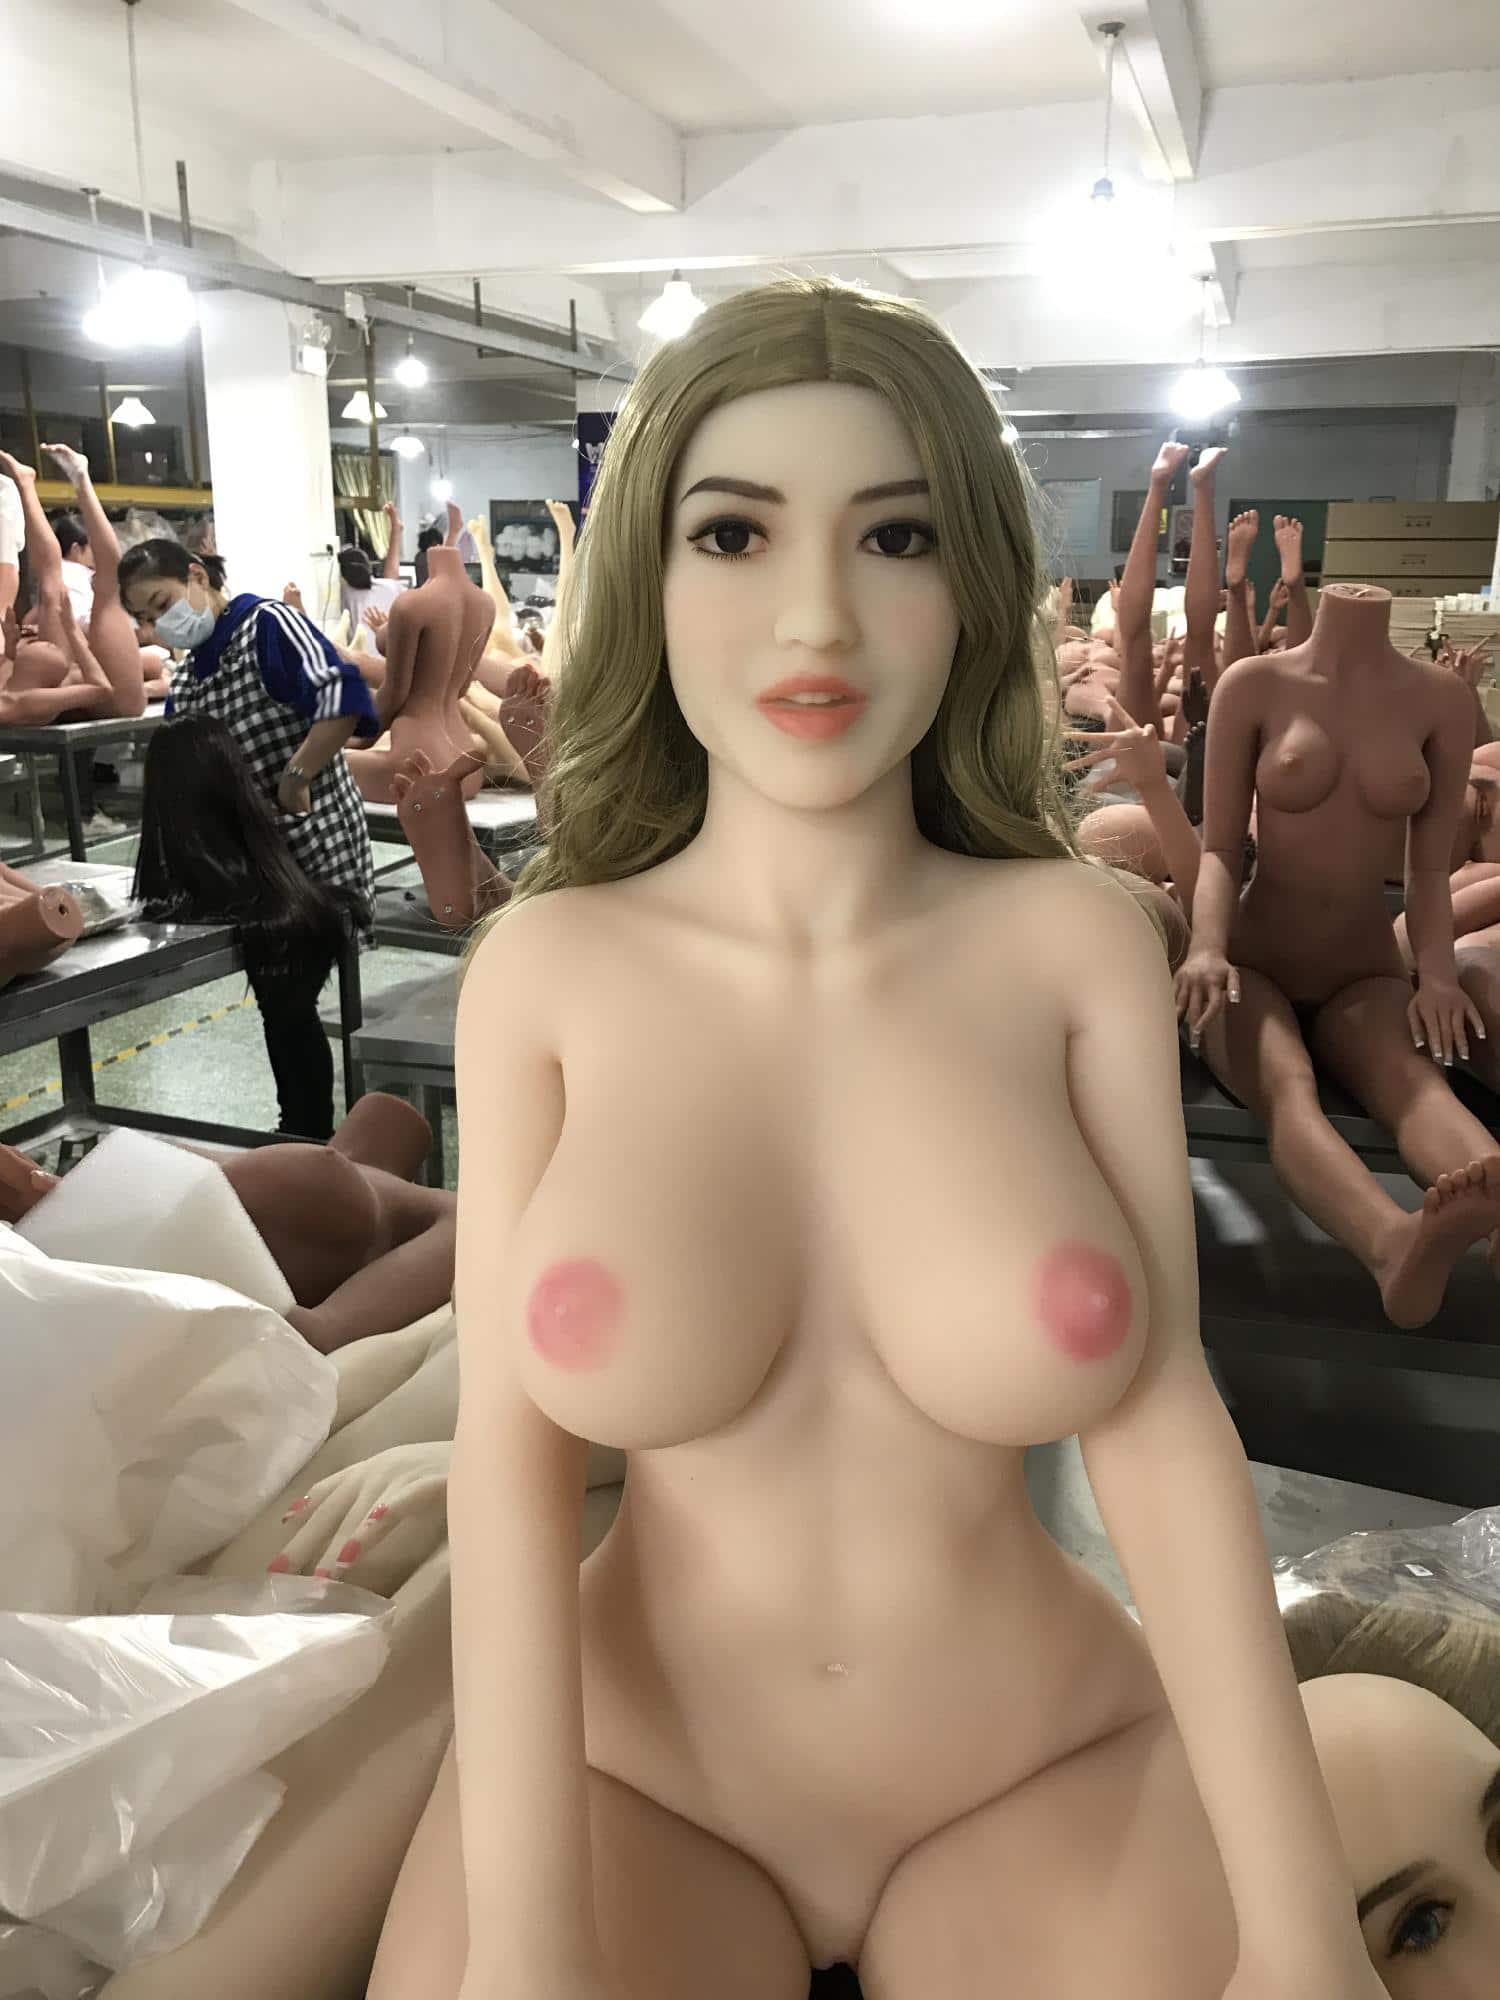 wm 170cm D cup white skin pink nipples head 265